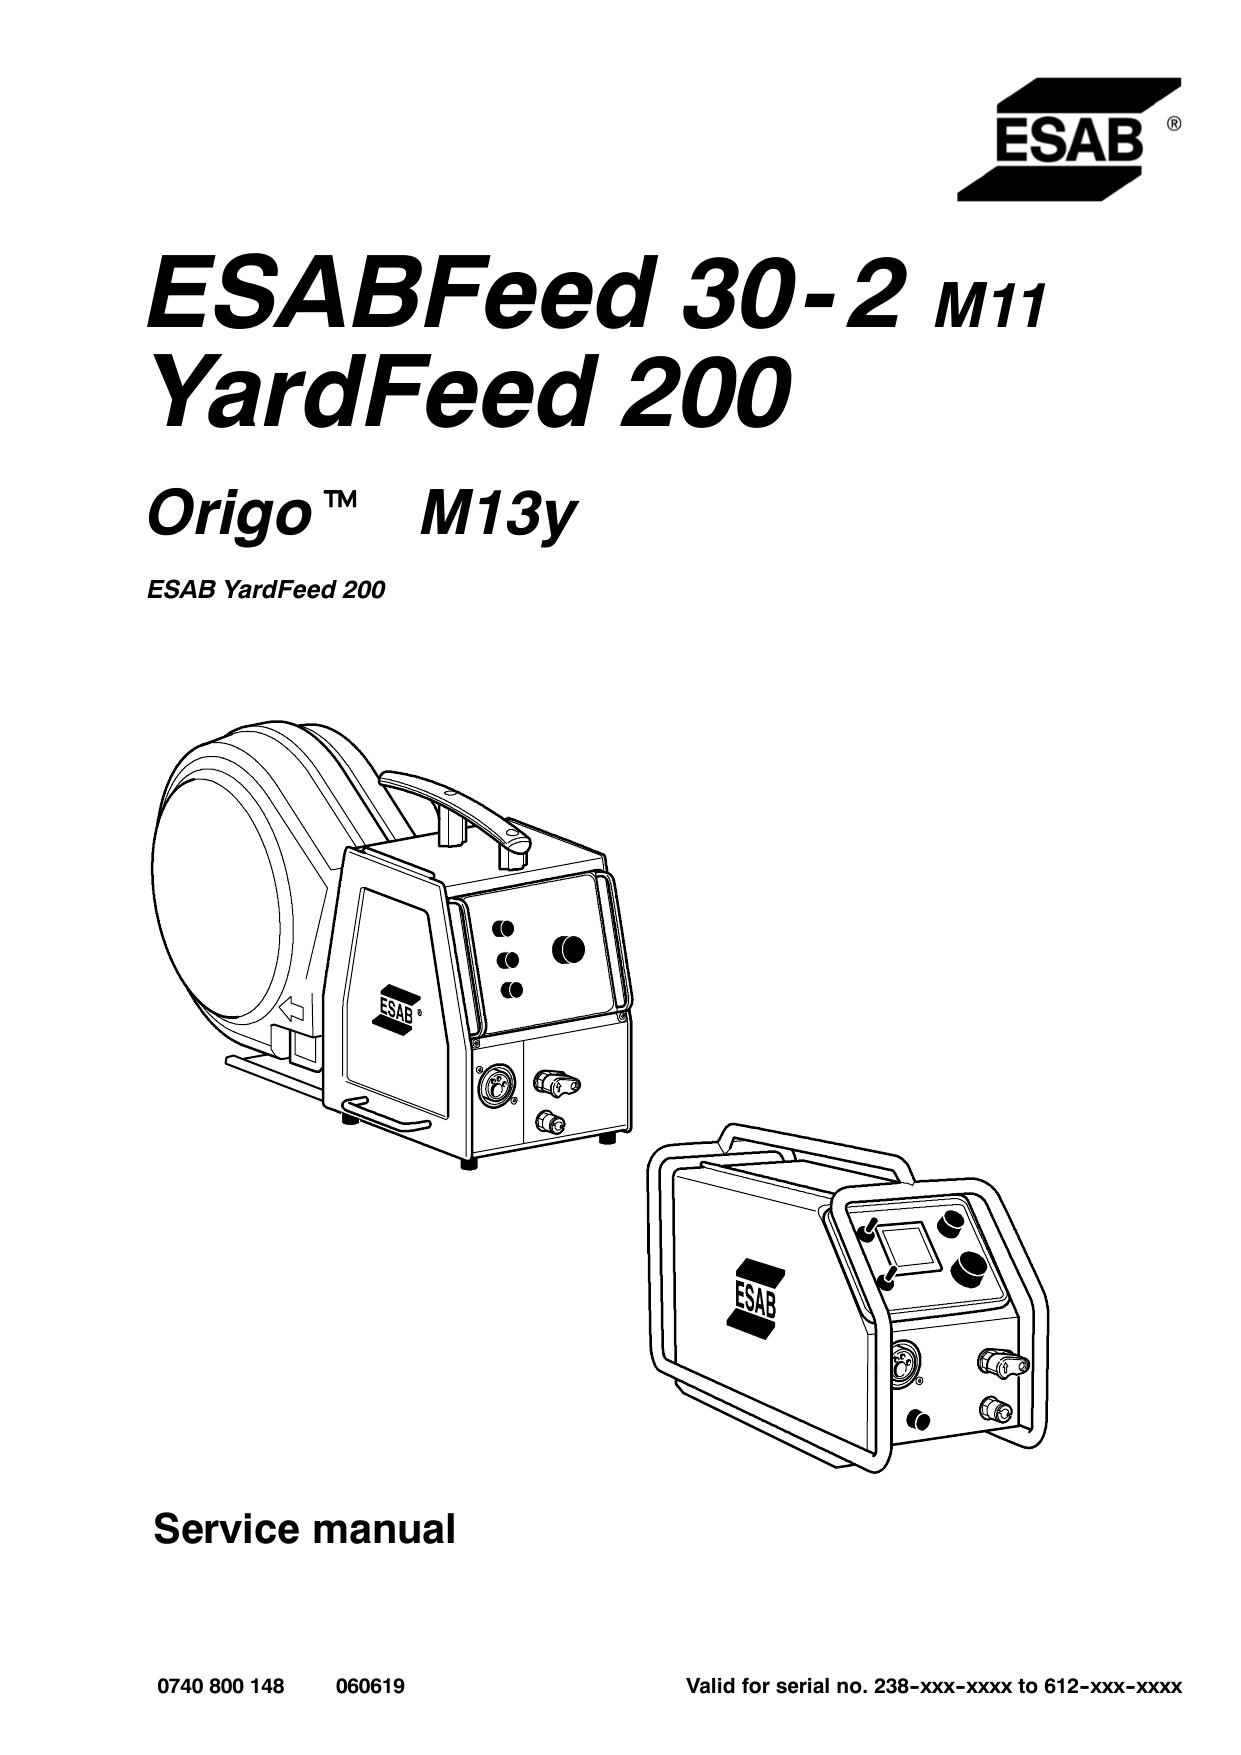 ESABFeed 30- 2 M11 YardFeed 200 | manualzz.com on